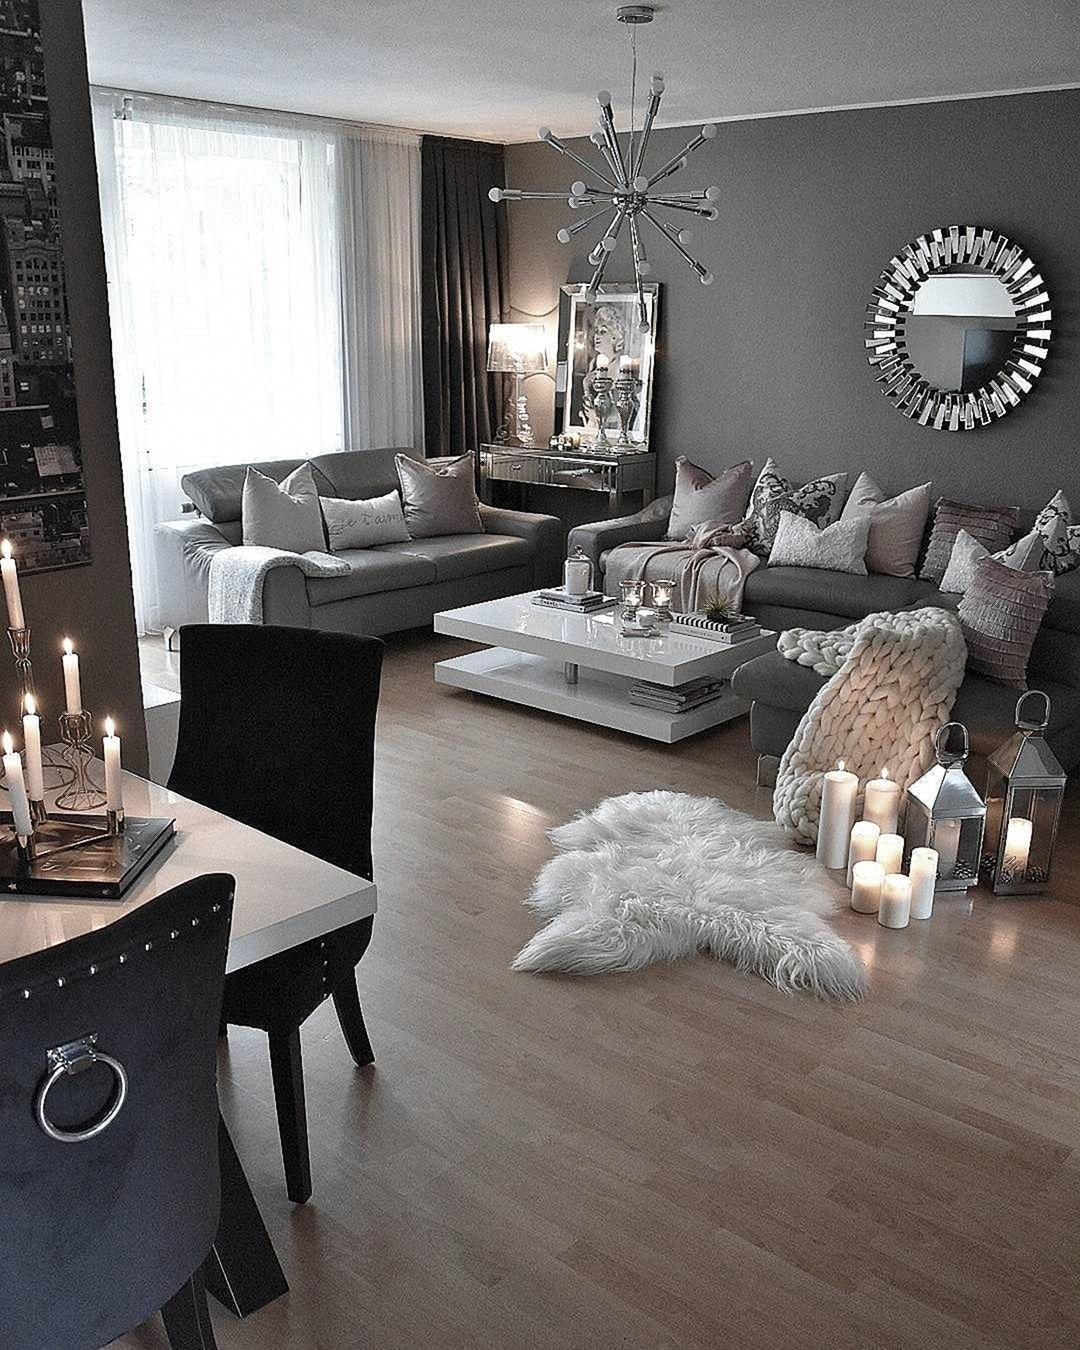 decorating tips #interiordecoratingbathrooms | #Deco en 2019 ...